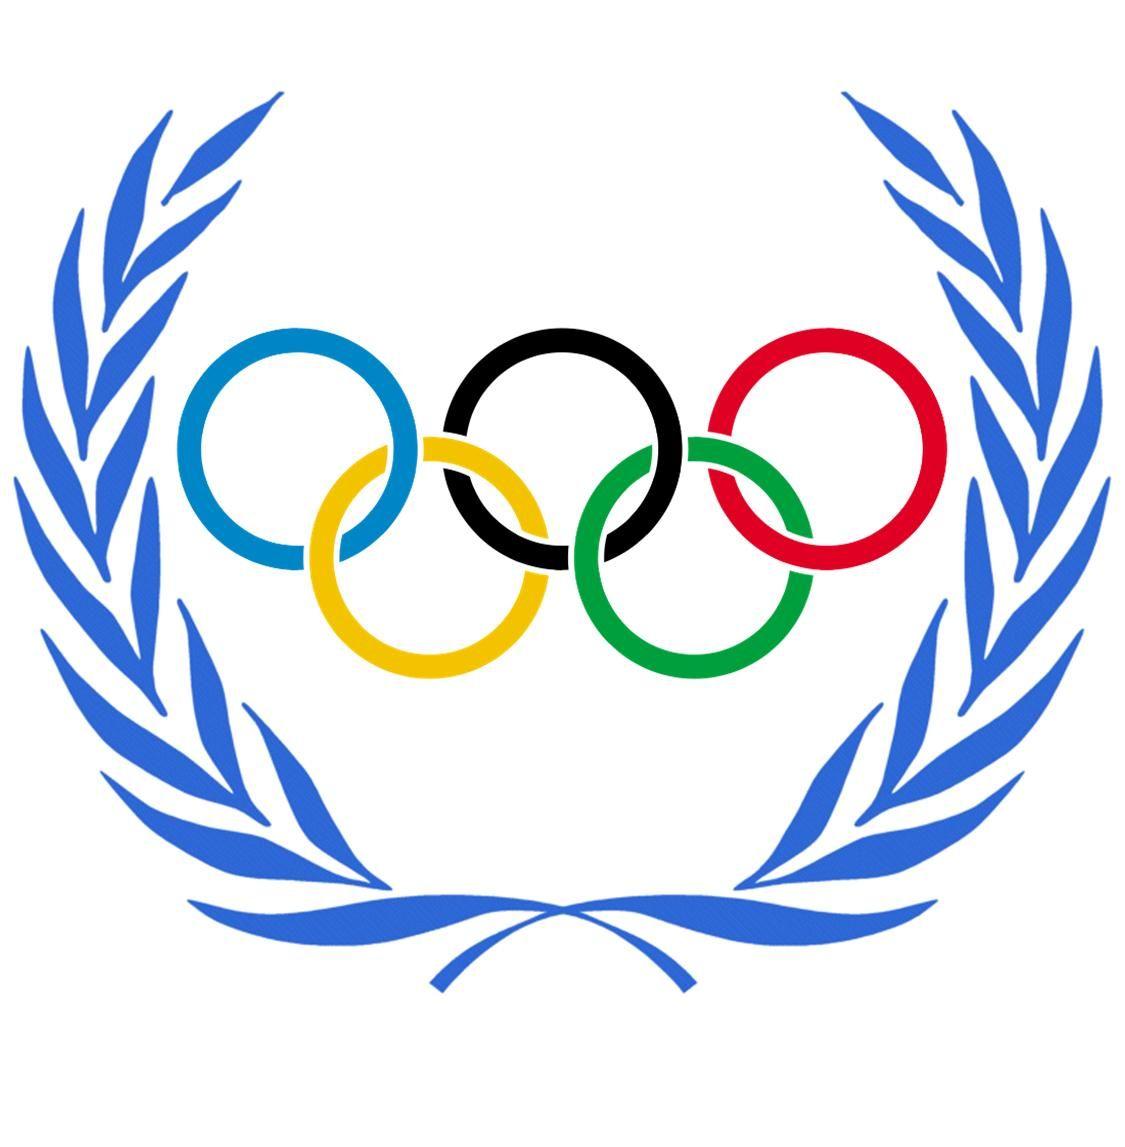 classic olympics symbol swifter higher faster pinterest rh pinterest com olympic rings border clip art usa olympic rings clipart